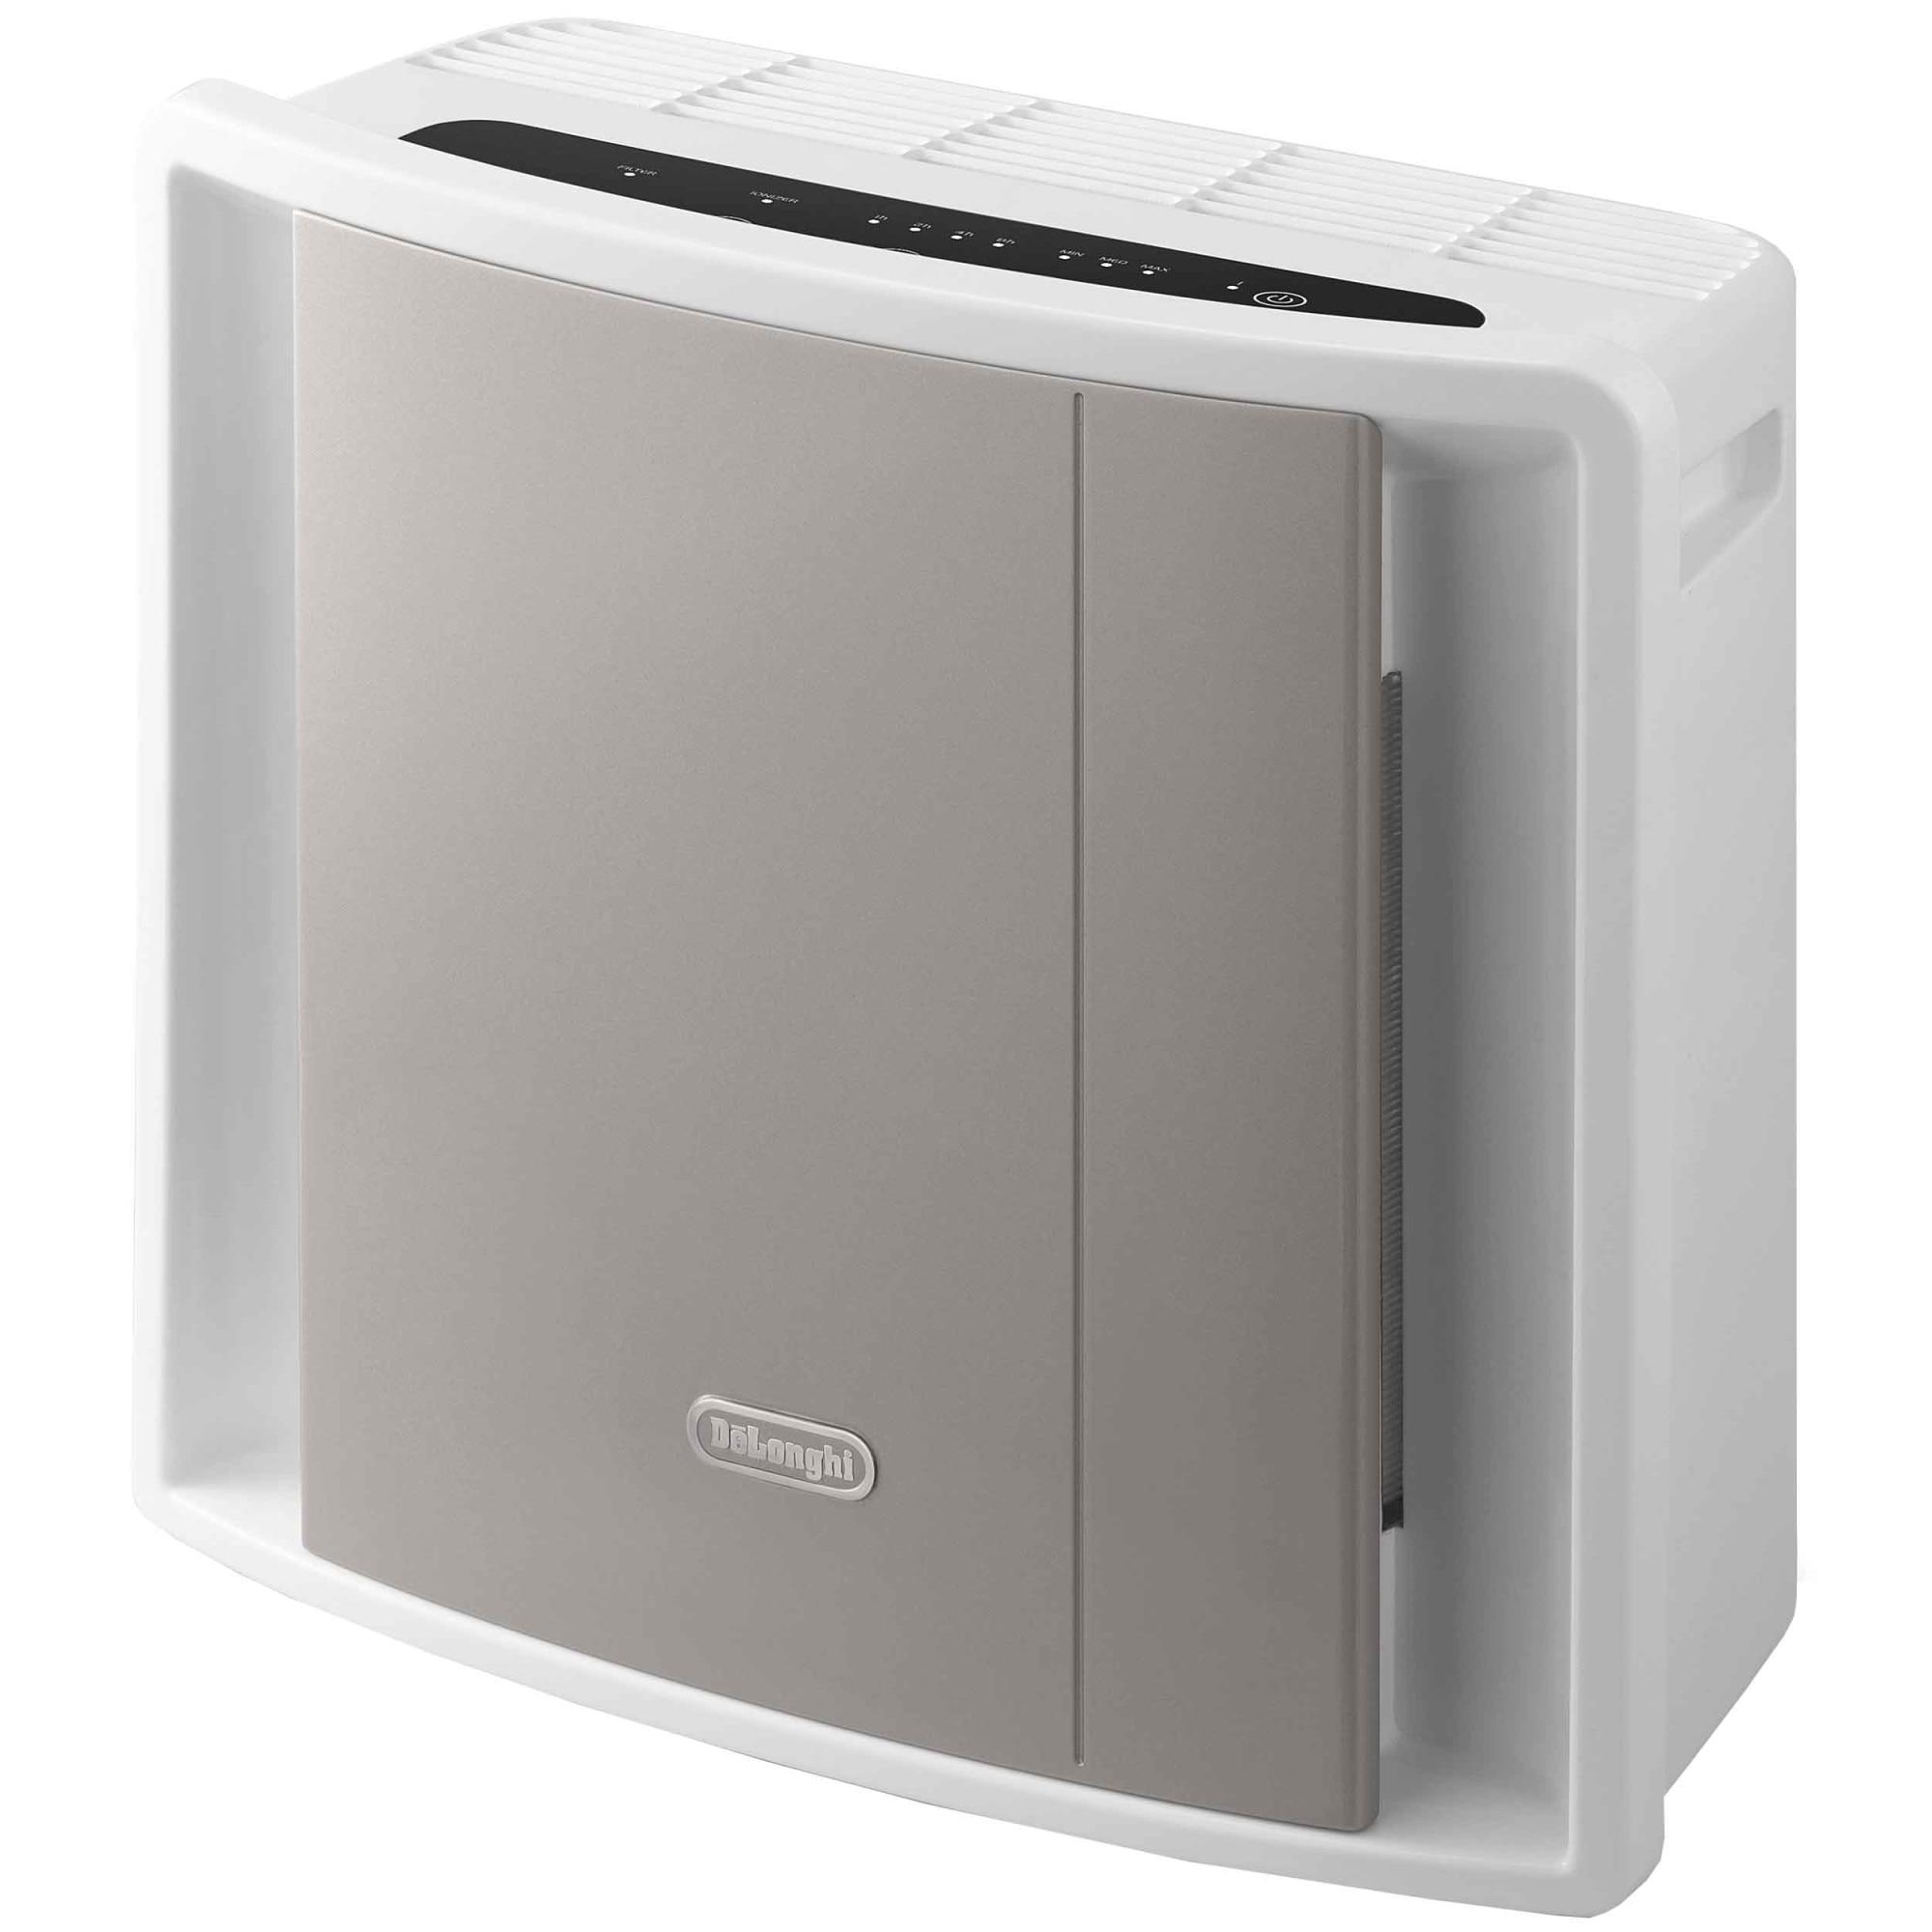 Fotografie Purificator de aer DE'LONGHI AC100, 130 m3/h, filtru HEPA + carbon activ, functie ionizare, recomandat pana la 40 m2